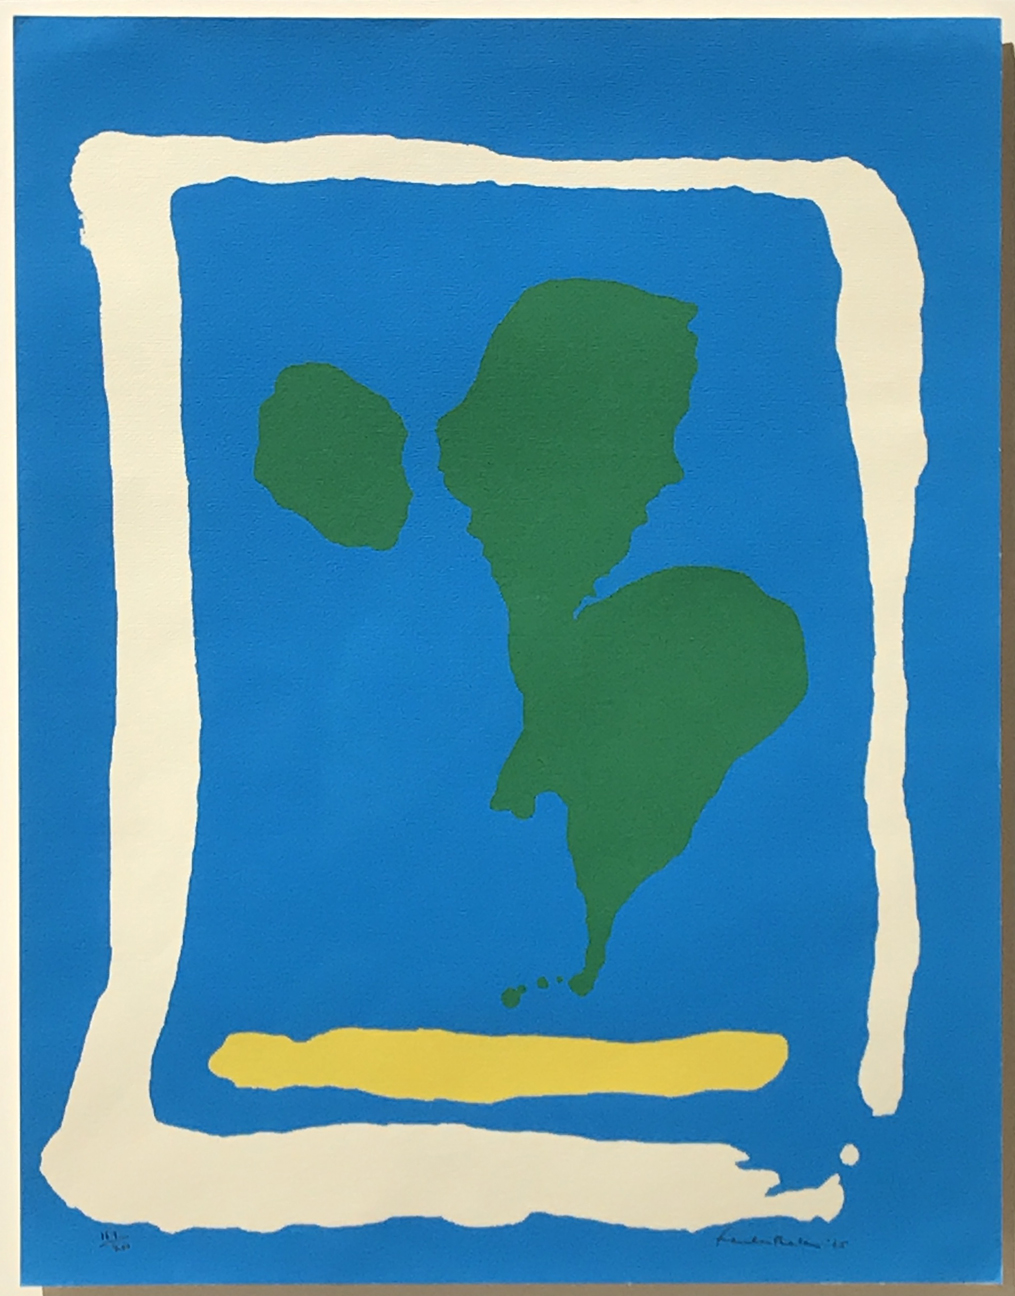 10.Helen Frankenthaler. Air Frame, 1965. Screenprint, ed. 157/200, 22 x 17 in.